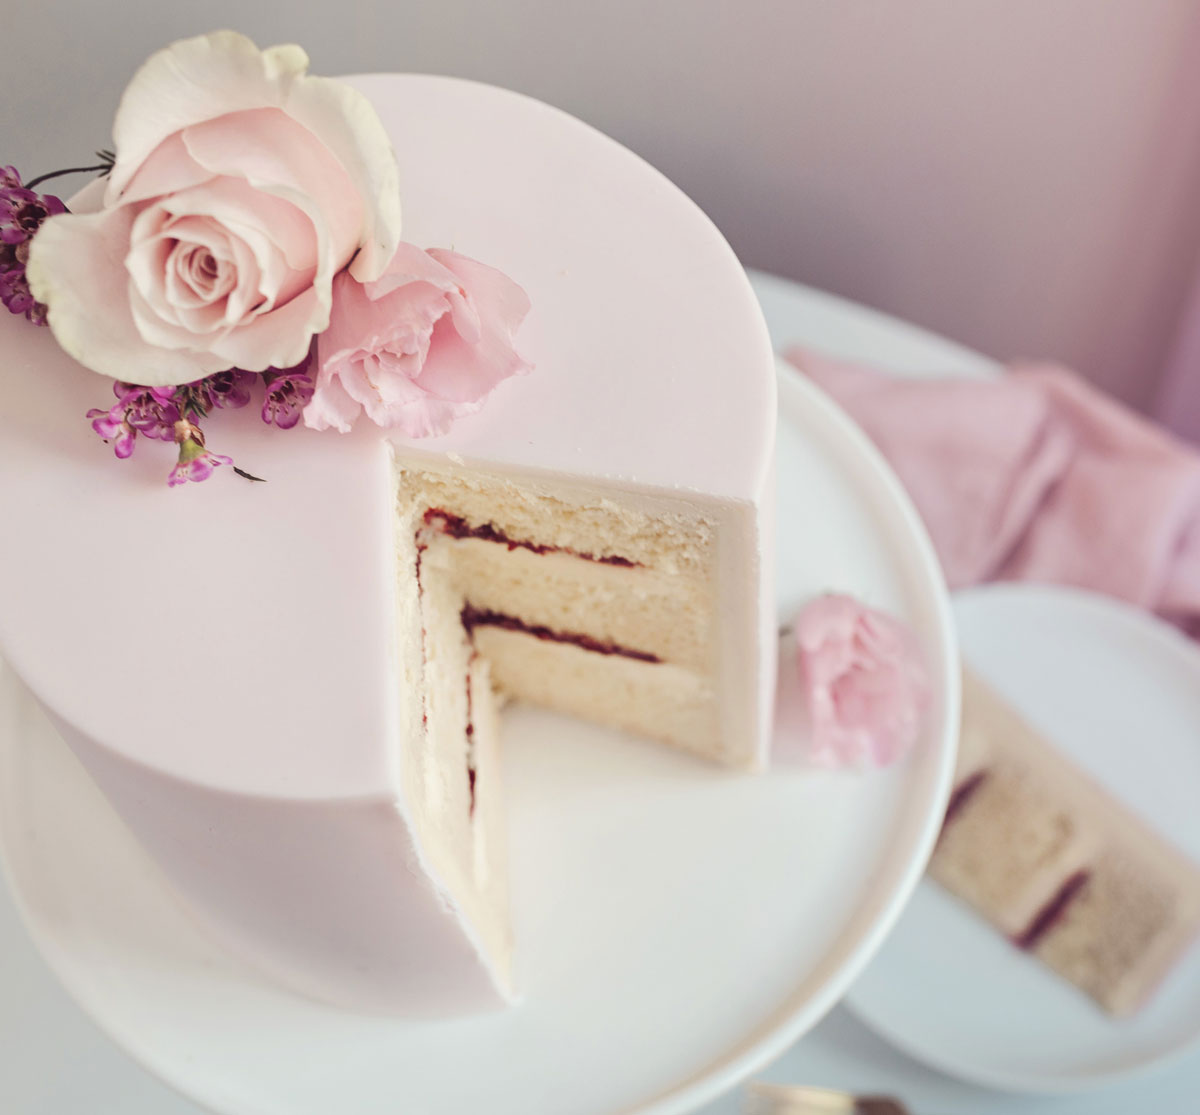 Cote How Luxury Wedding Cake with Fondant Icing